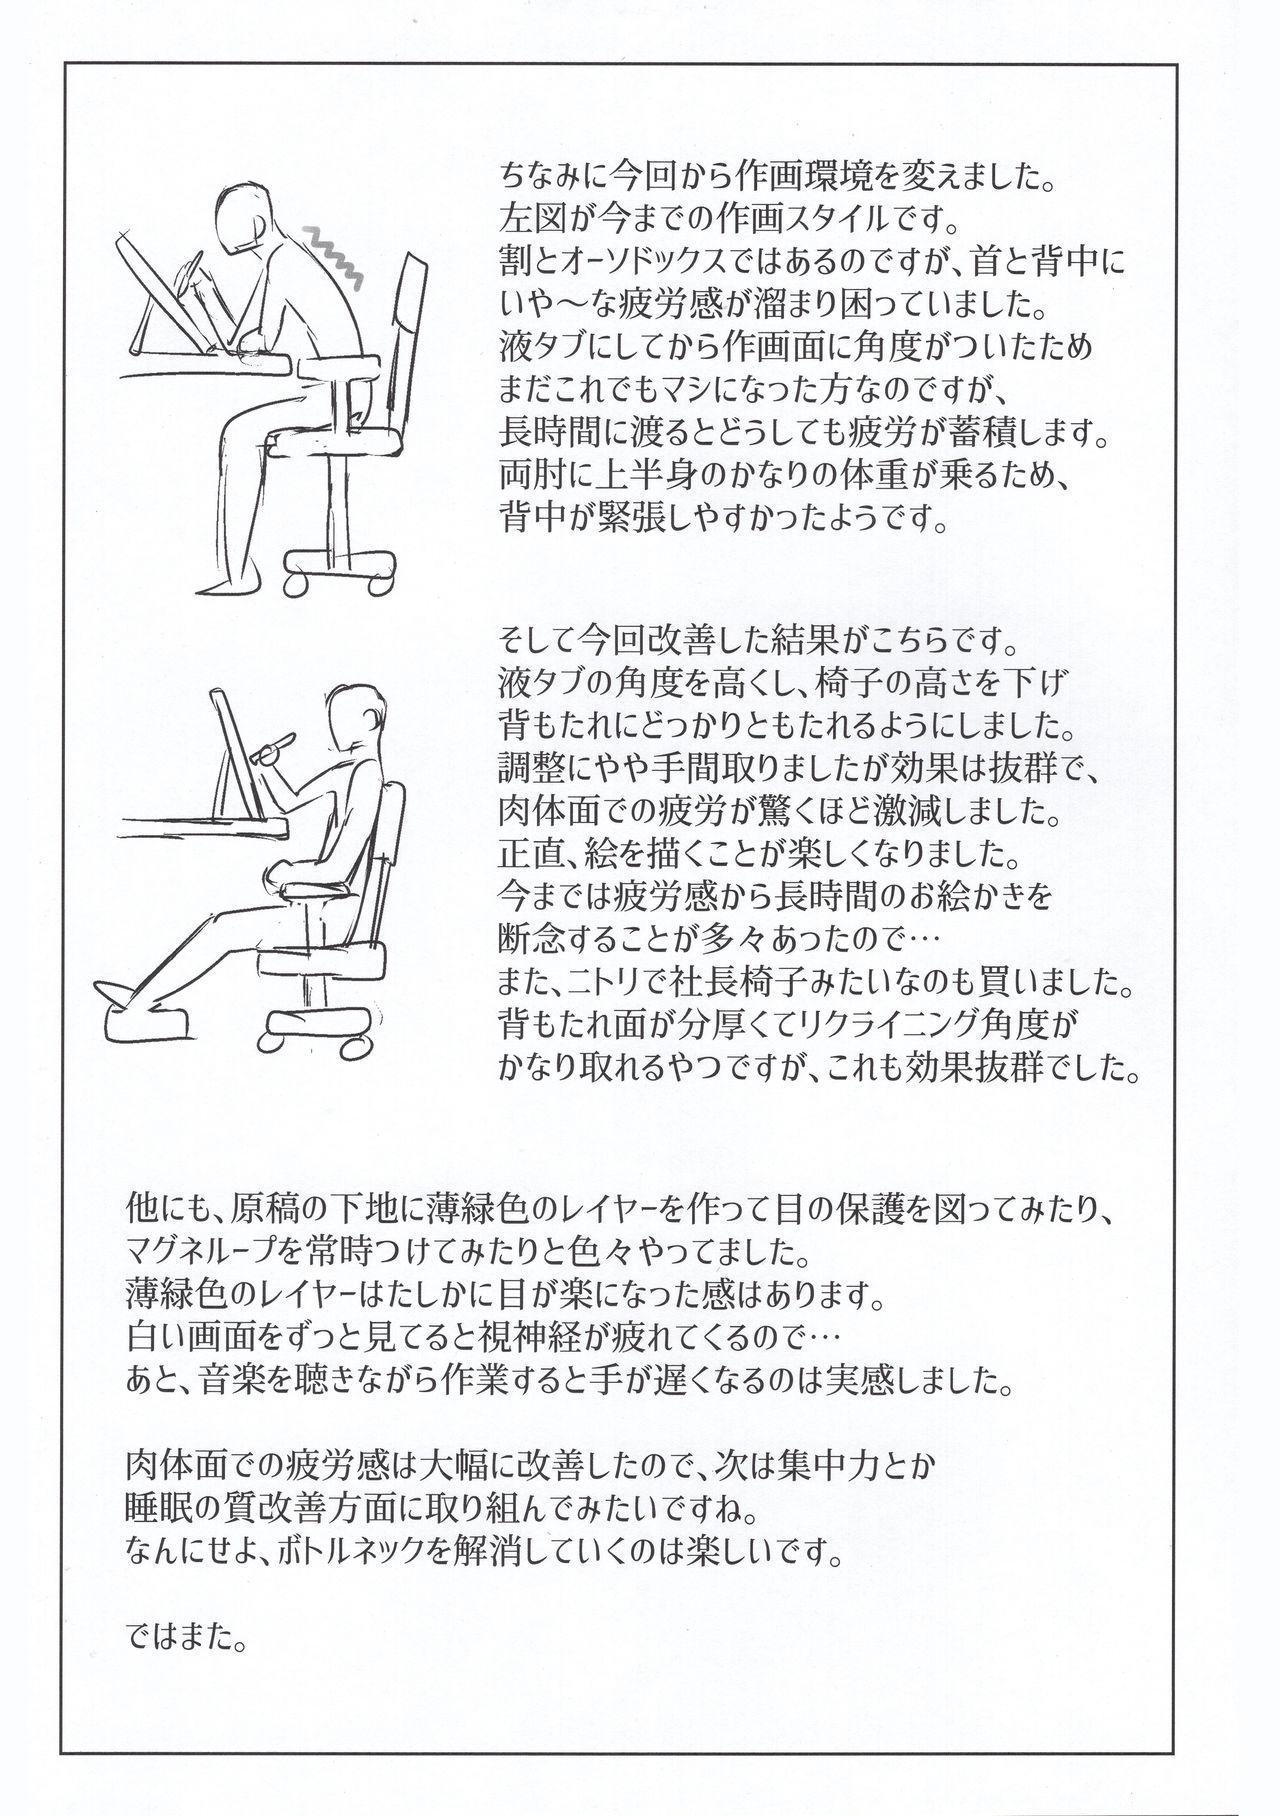 Komi-ke no Kyoudai Asobi 31